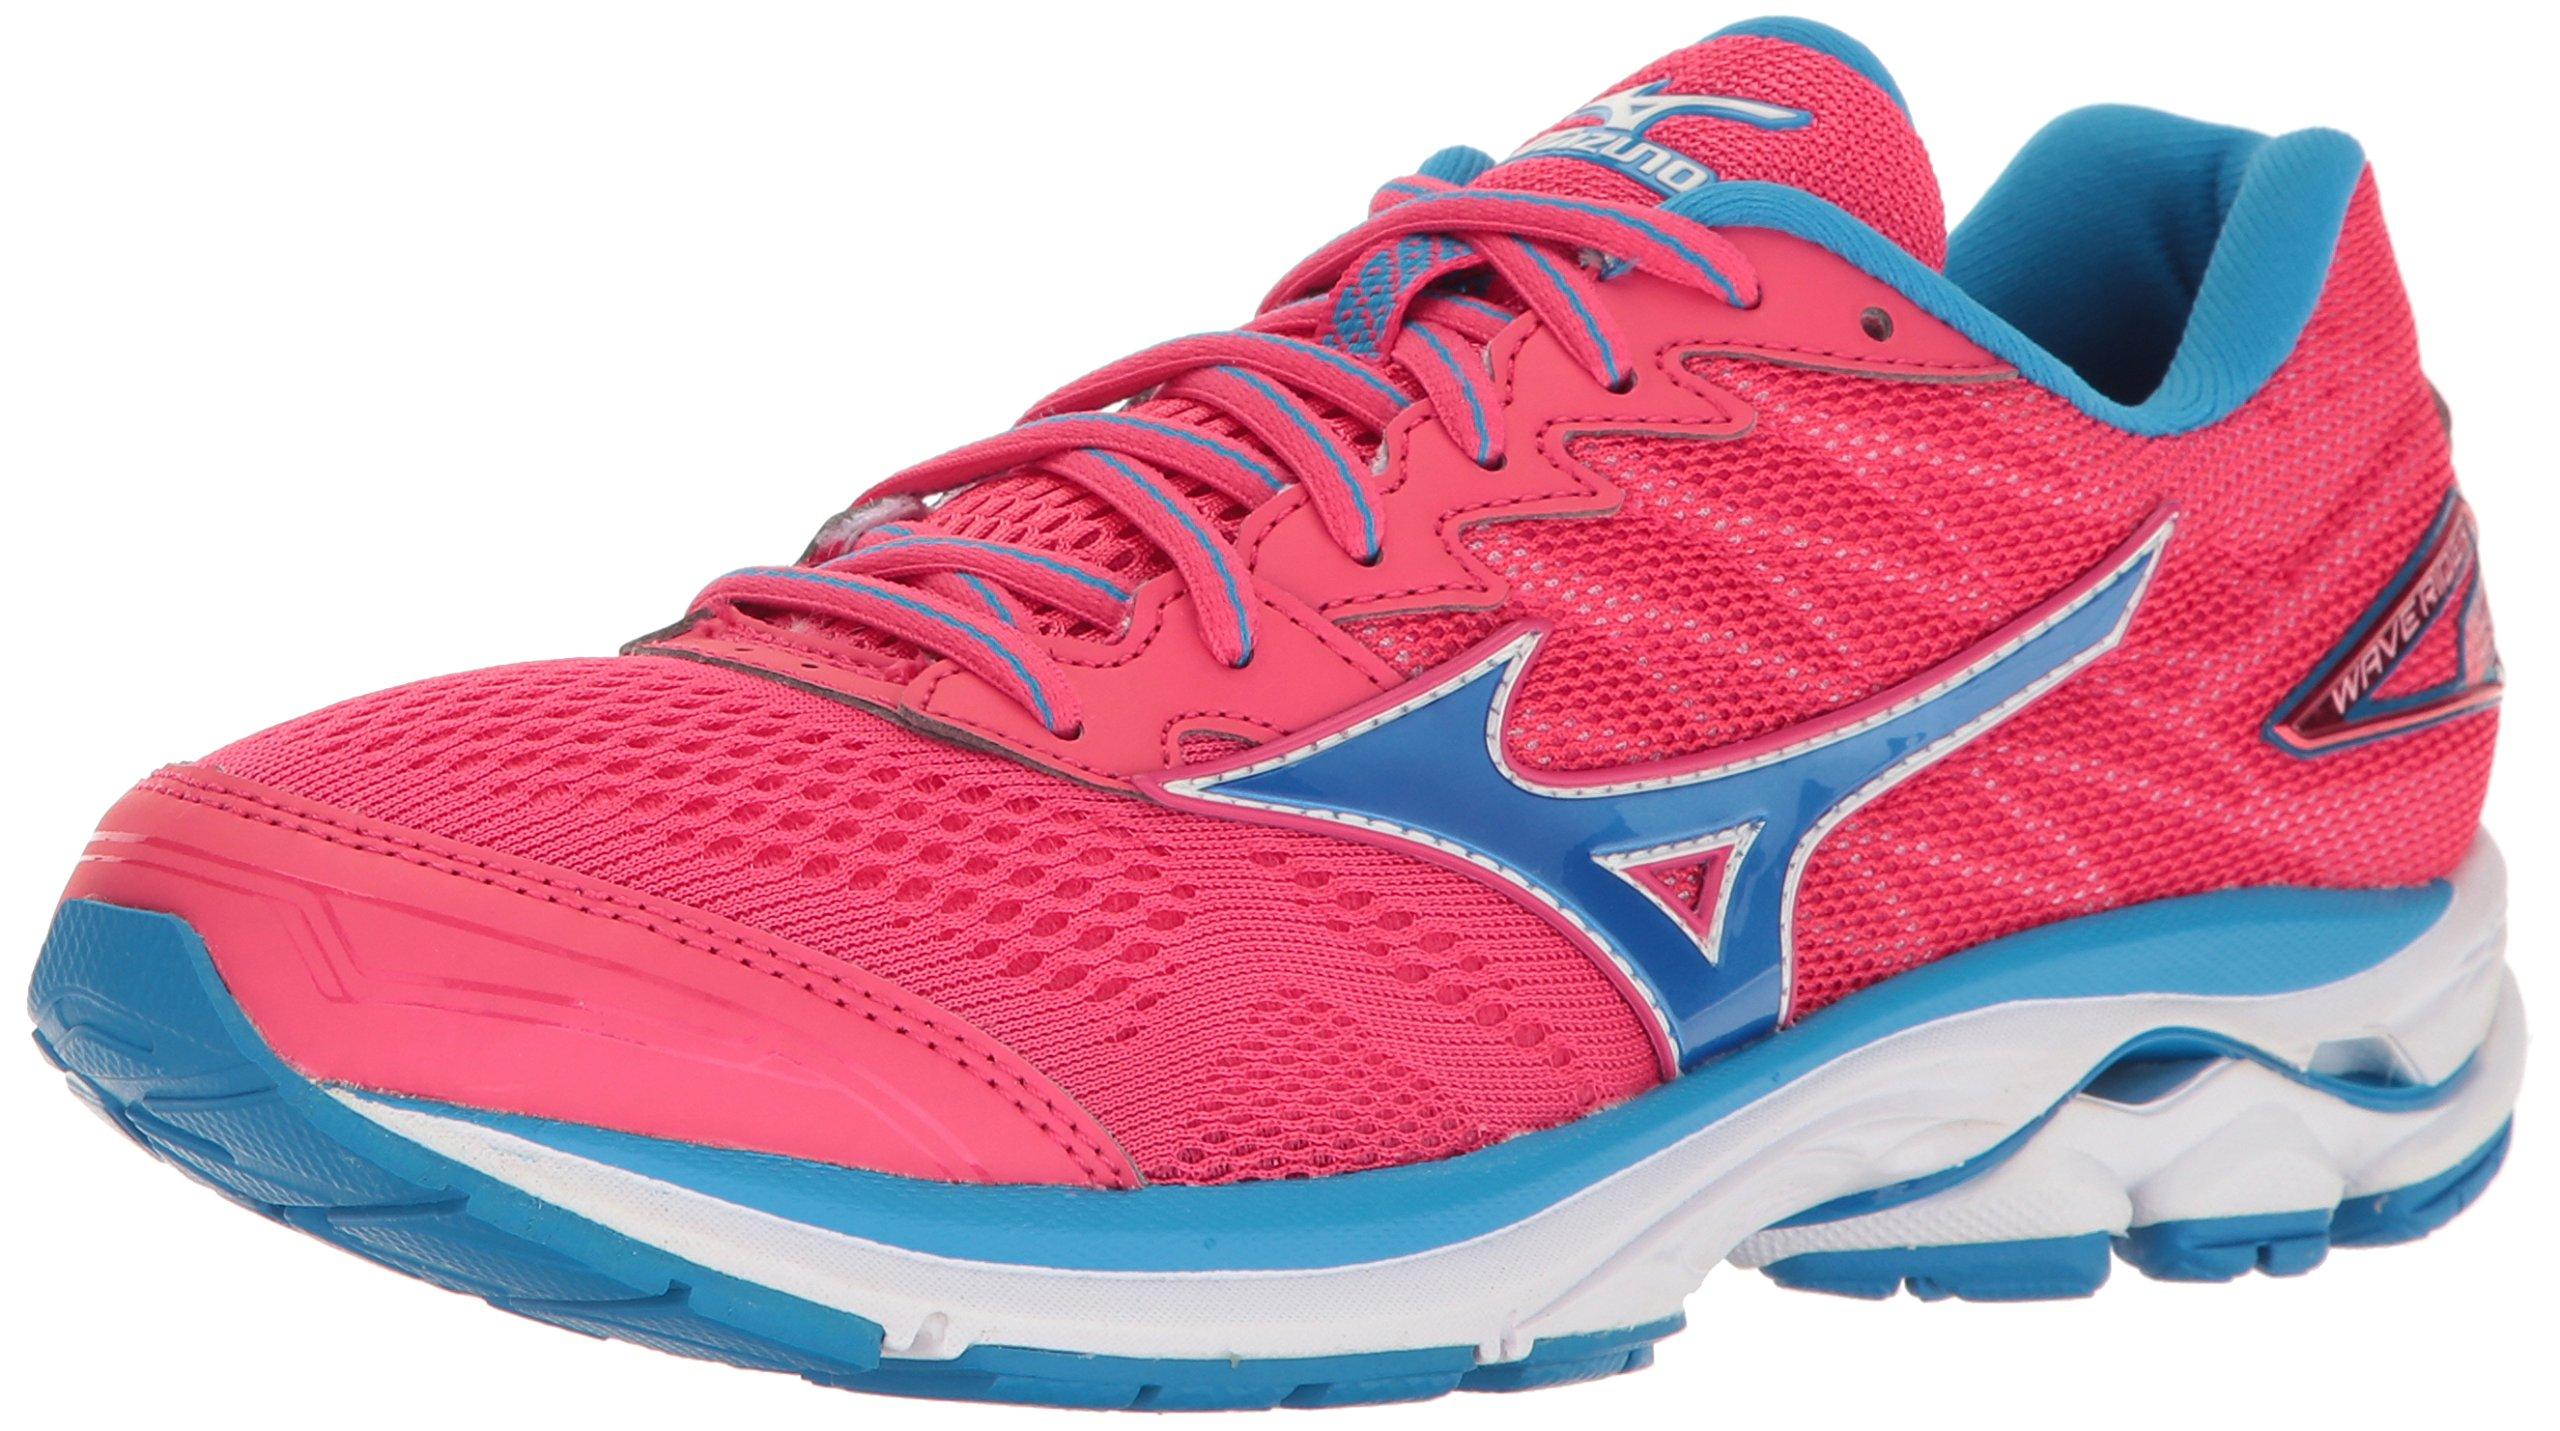 Mizuno Running Women's Wave Rider 20 Shoes, Paradise Pink/Blue Aster/White, 7.5 B US